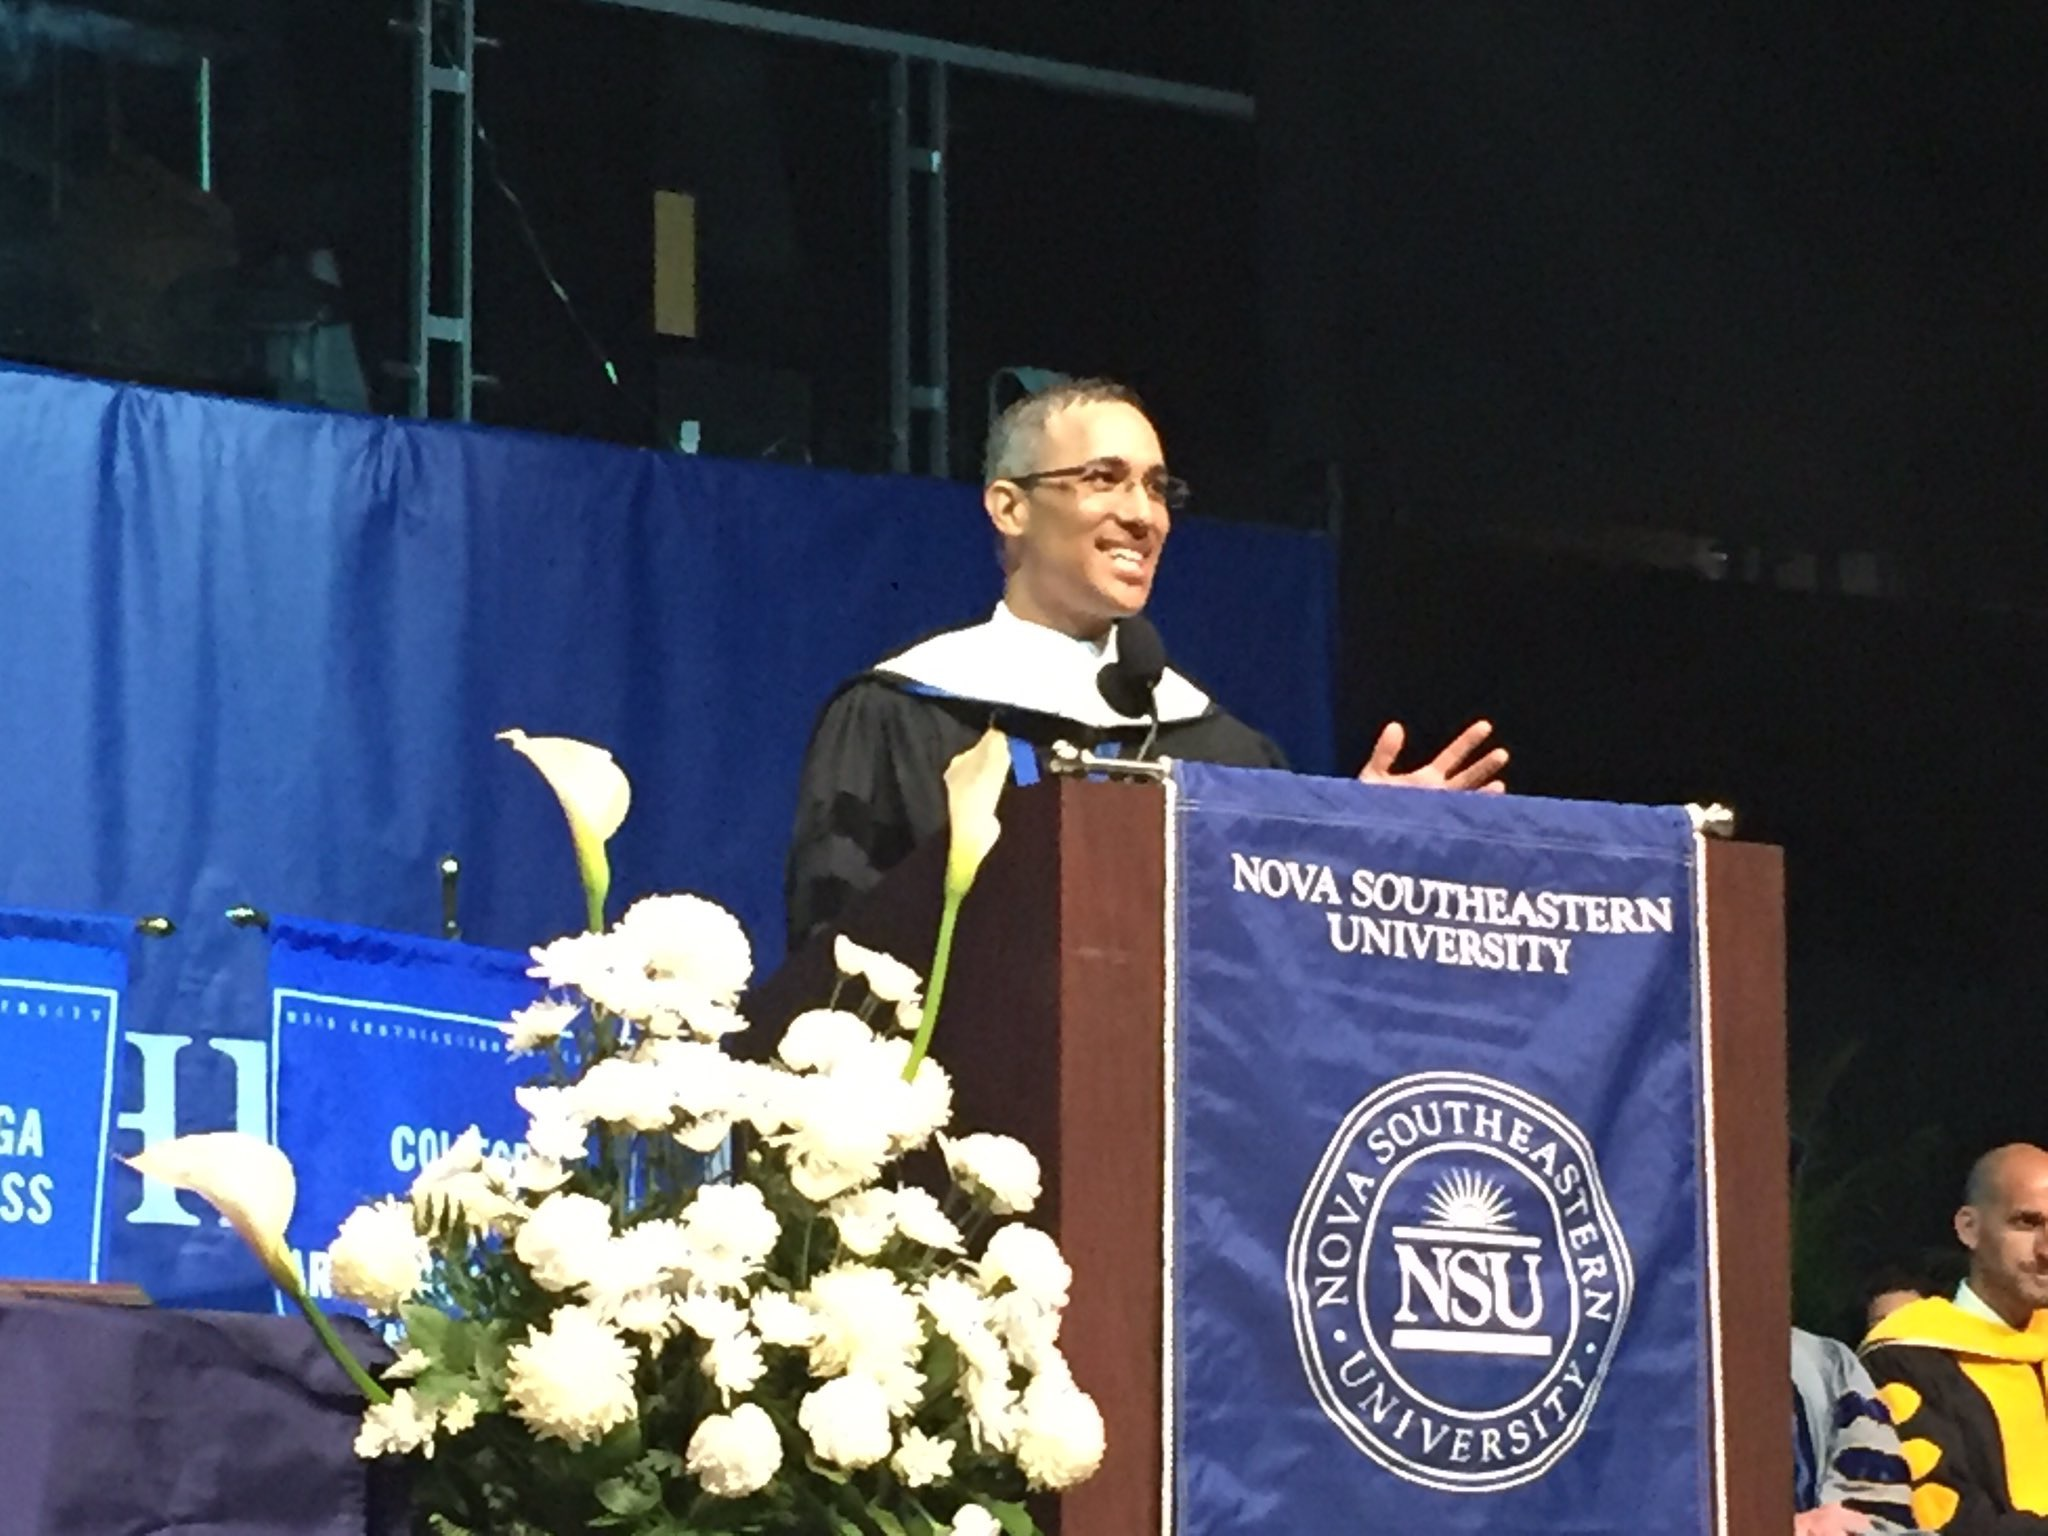 MSM's Daniel Dawes Tells Nova Southeastern University Graduates to 'Write Their Own Chapter'